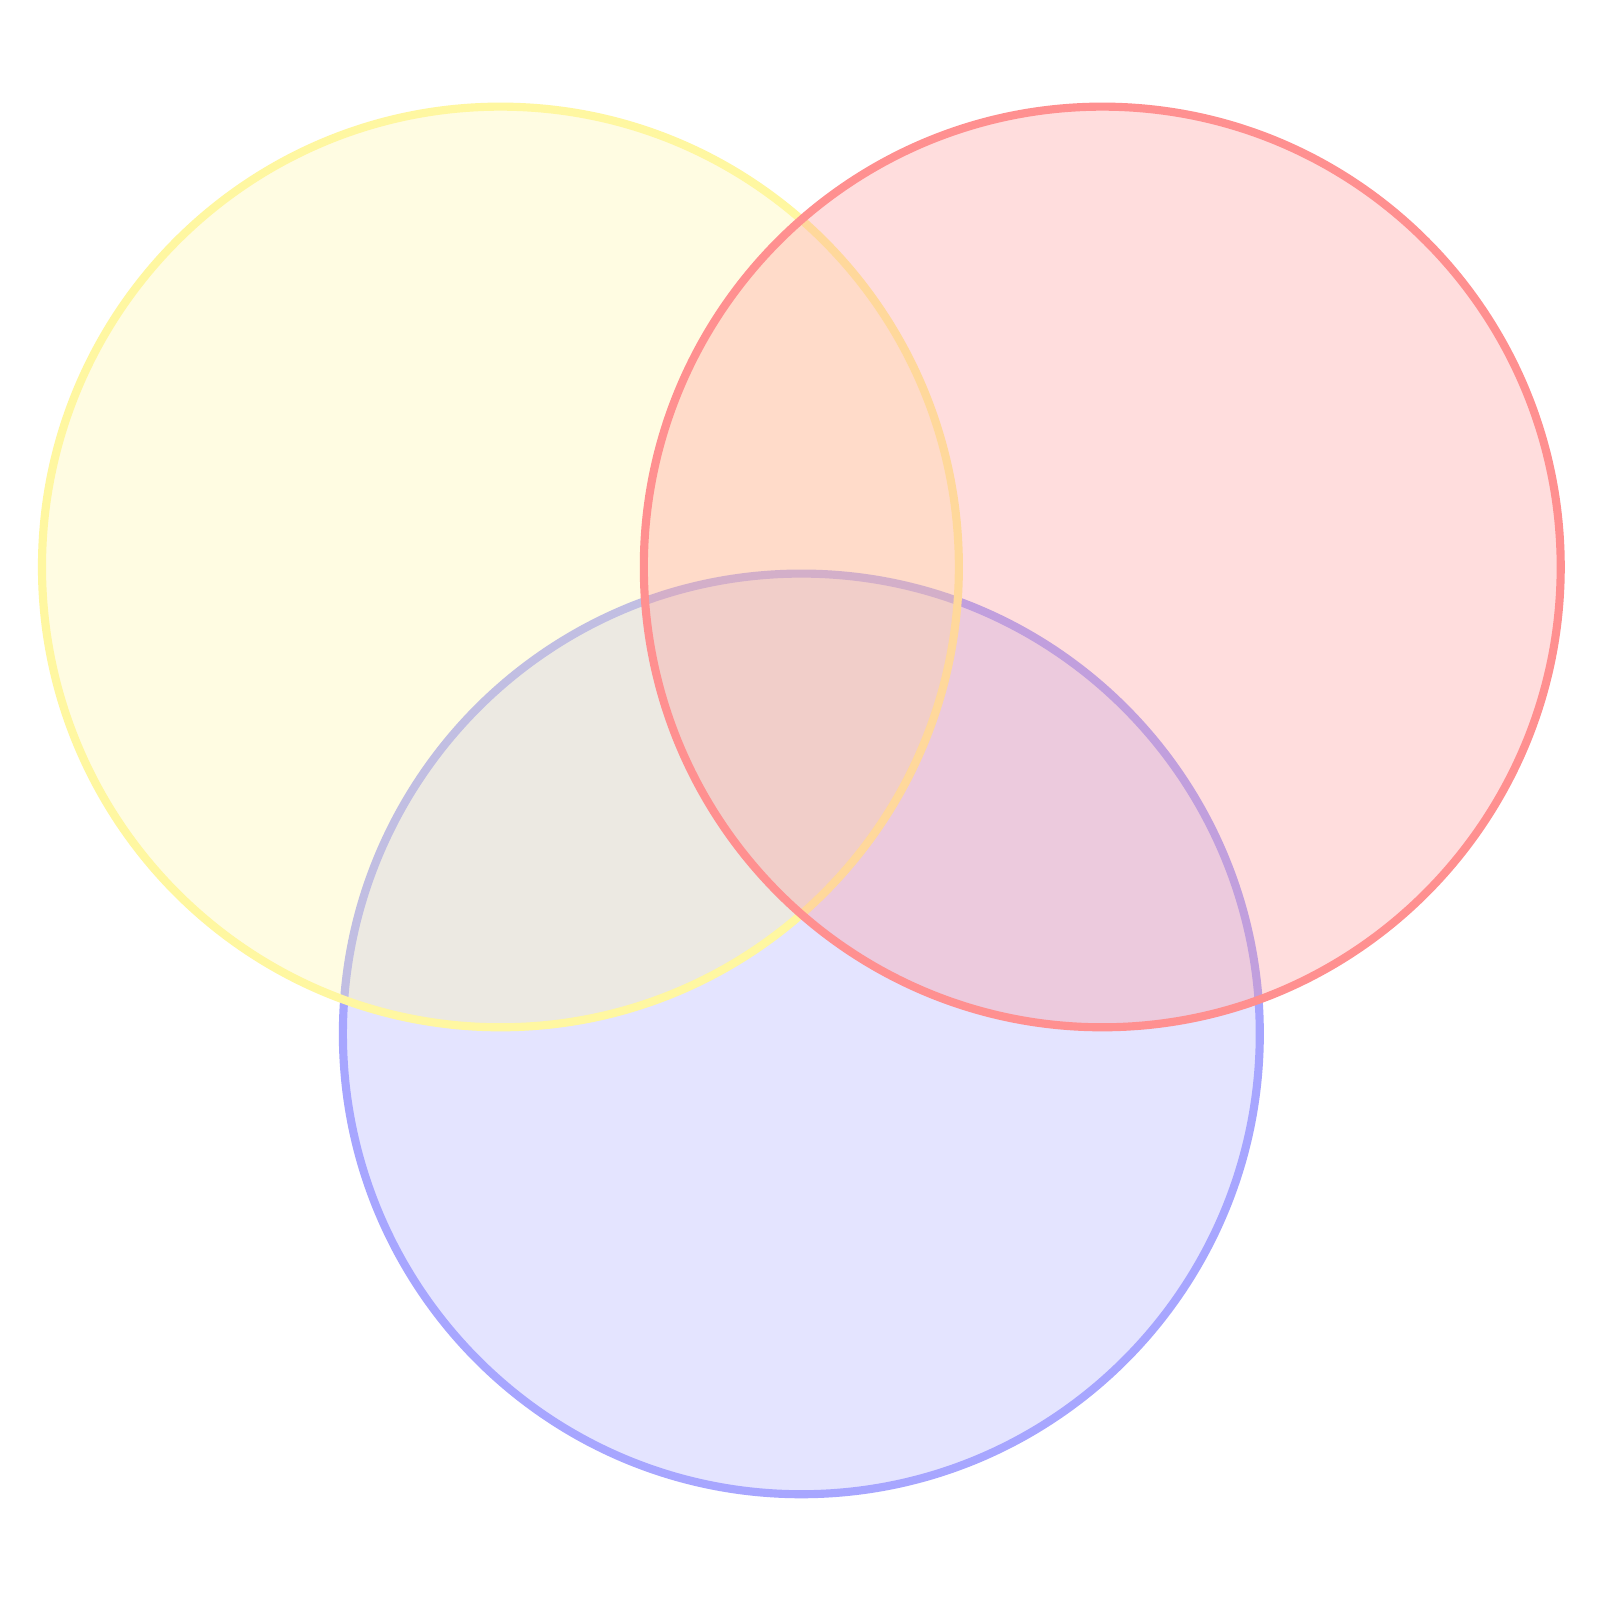 шаблон диаграммы Венна из трех кругов